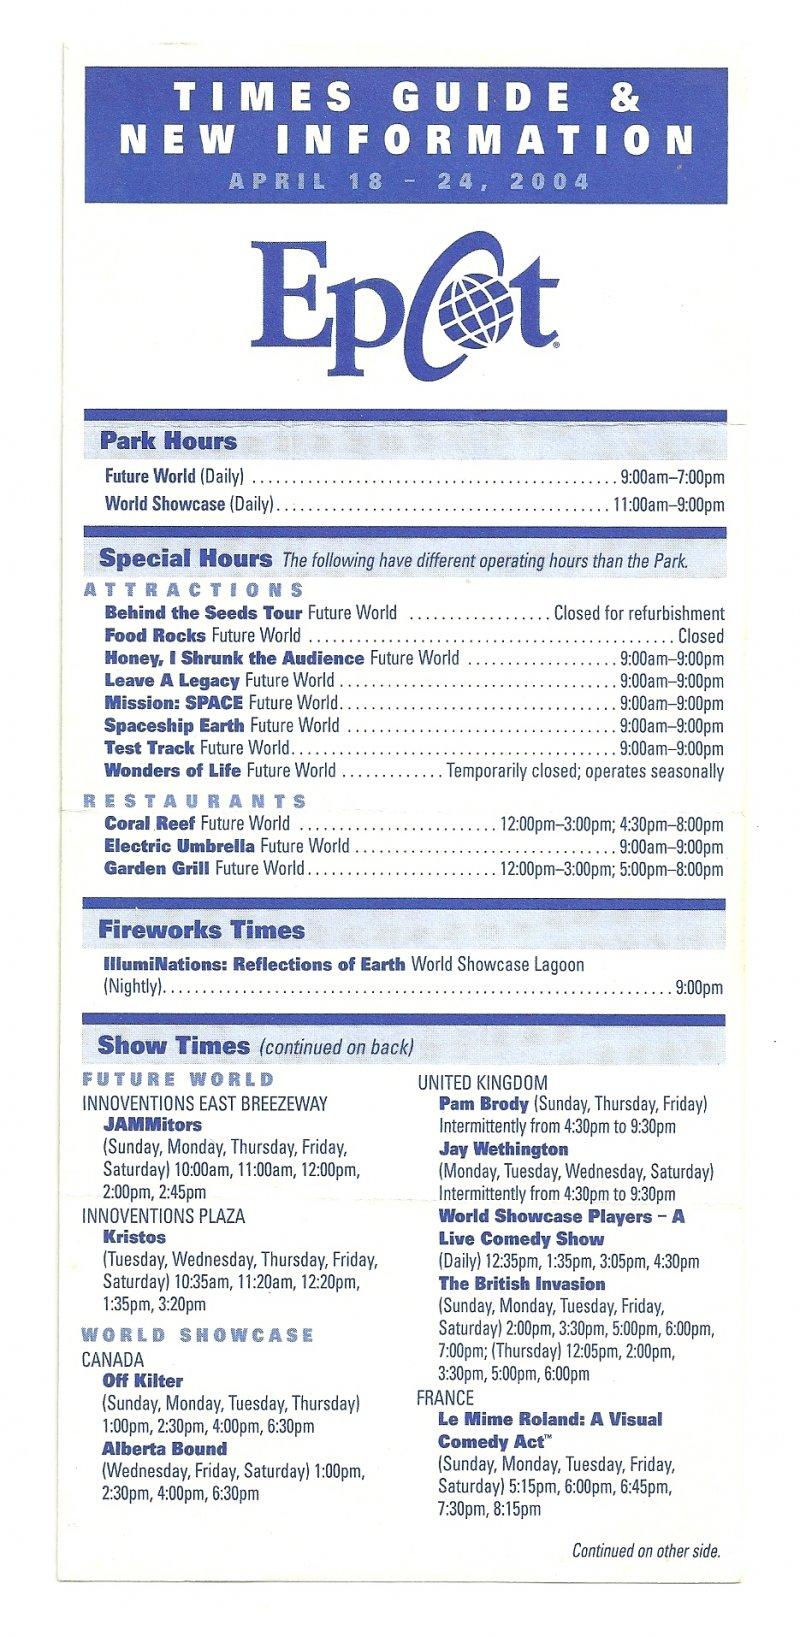 Image 0 of 2004 walt disney world Epcot Center Times guide Flyer April 18-24